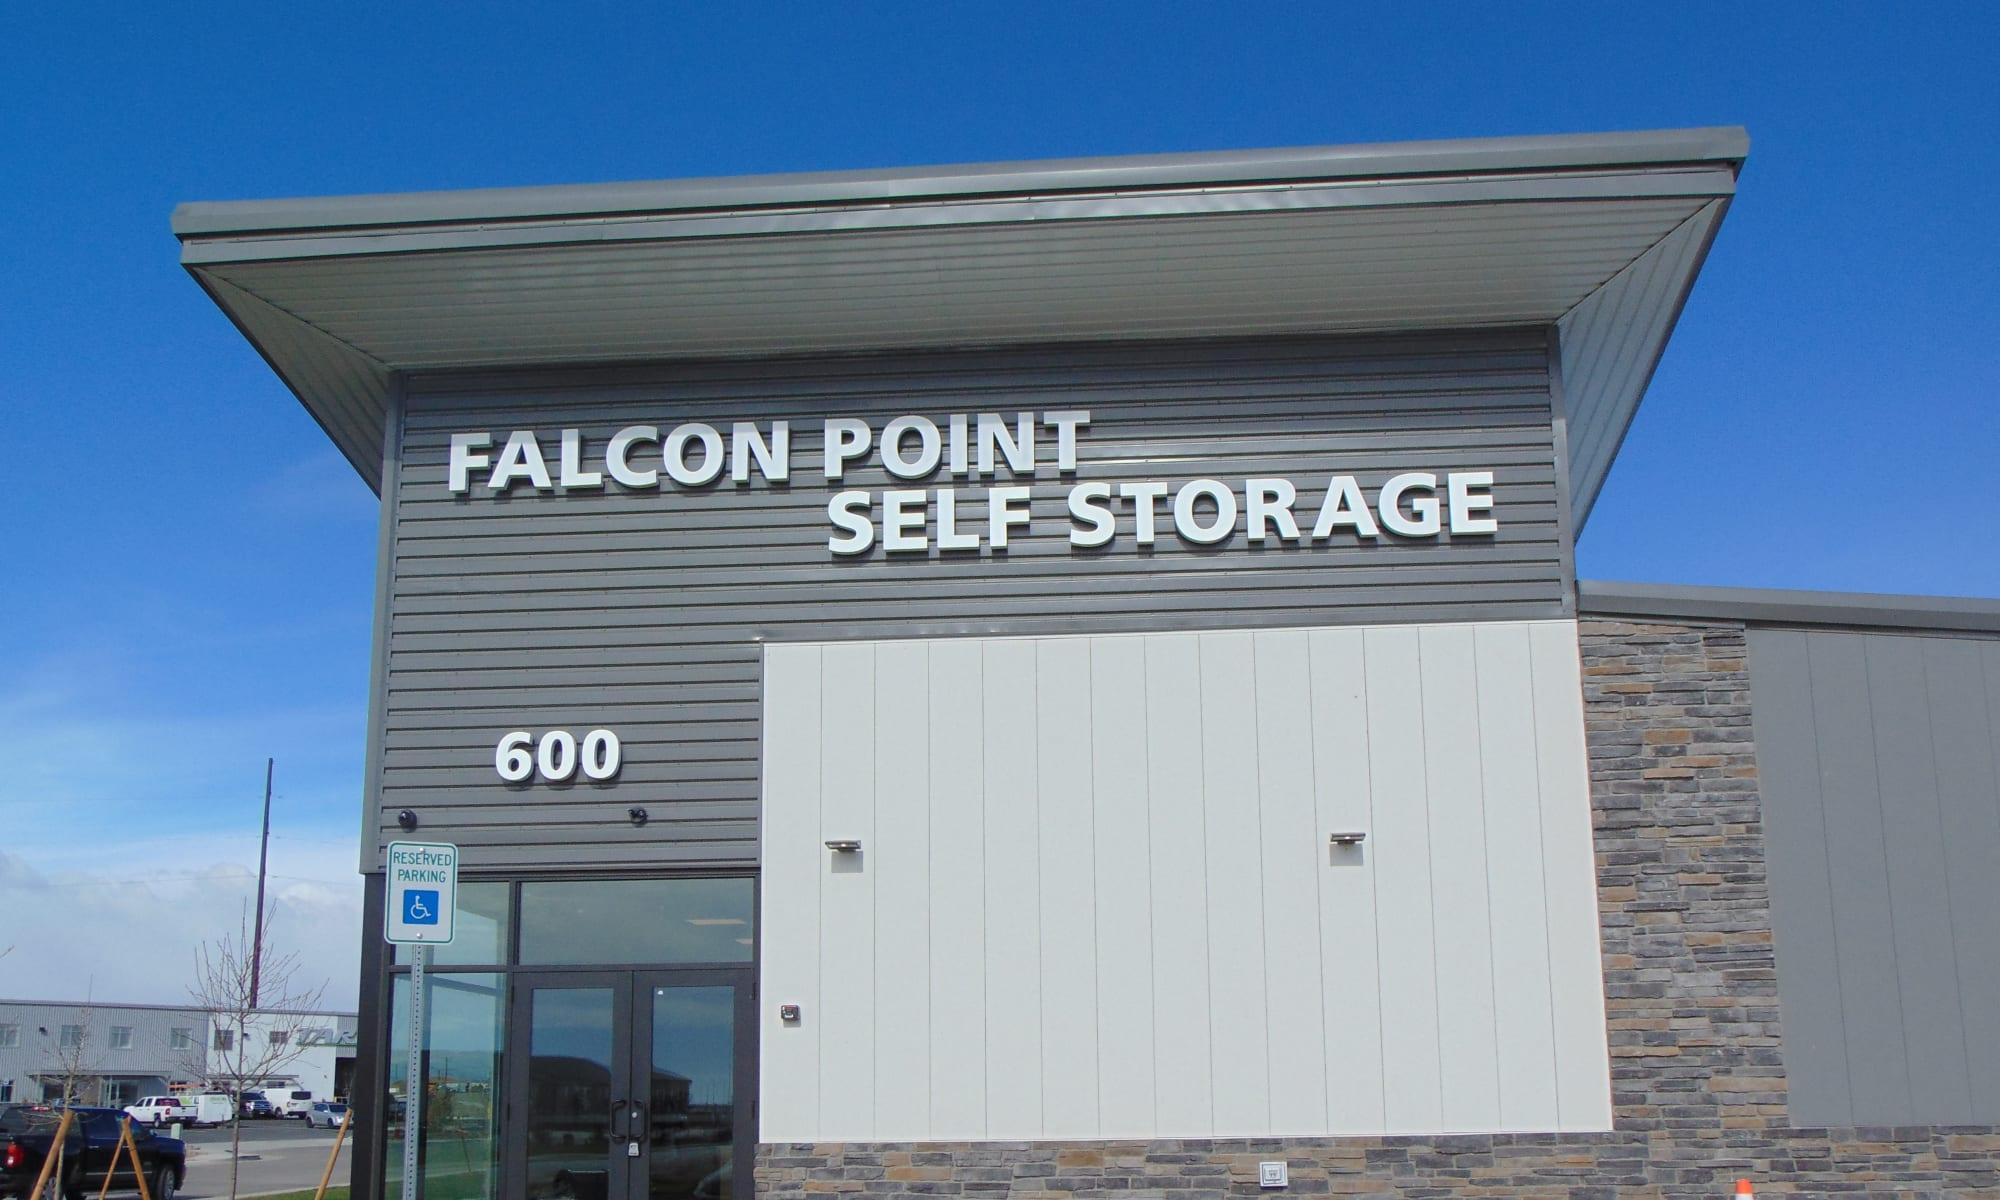 Falcon Point Self Storage in Windsor, Colorado